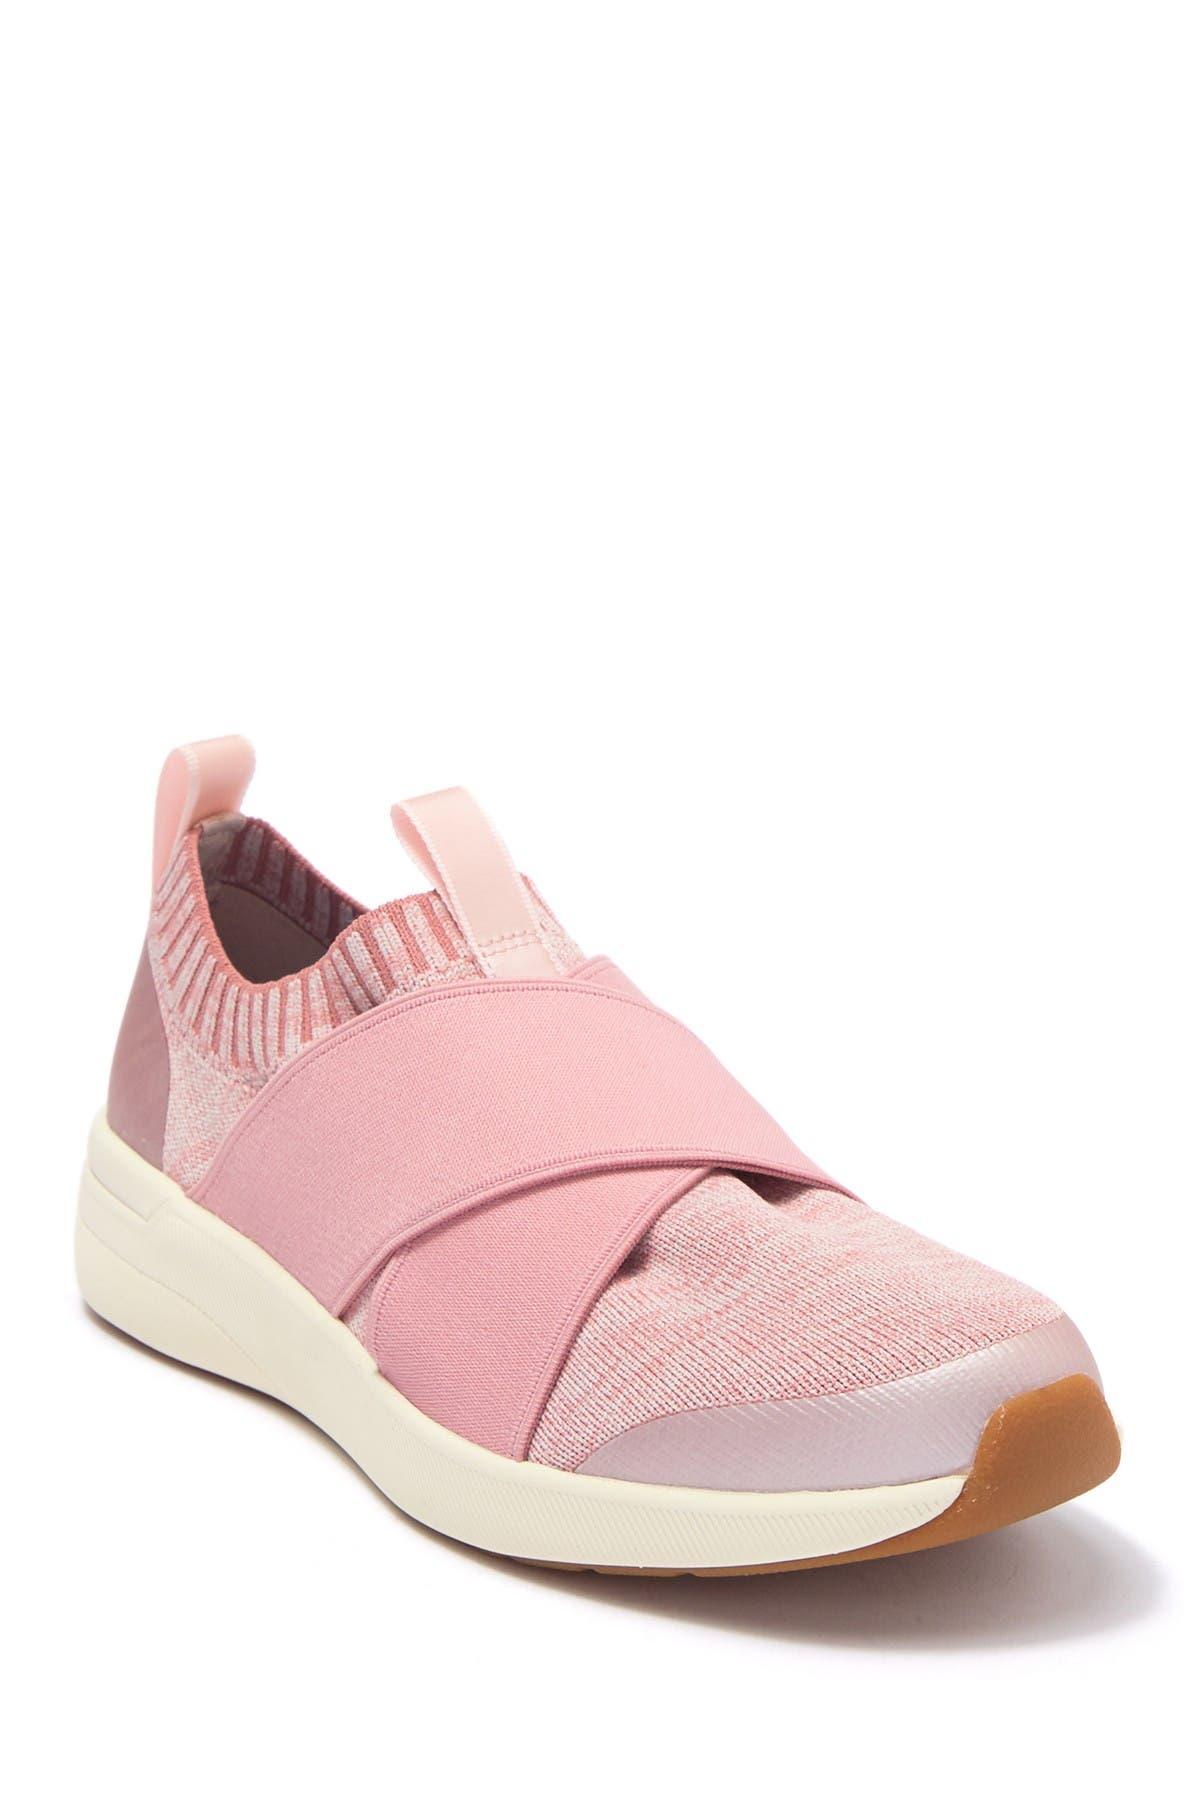 Keds | Studio Jumper Knit Sneaker